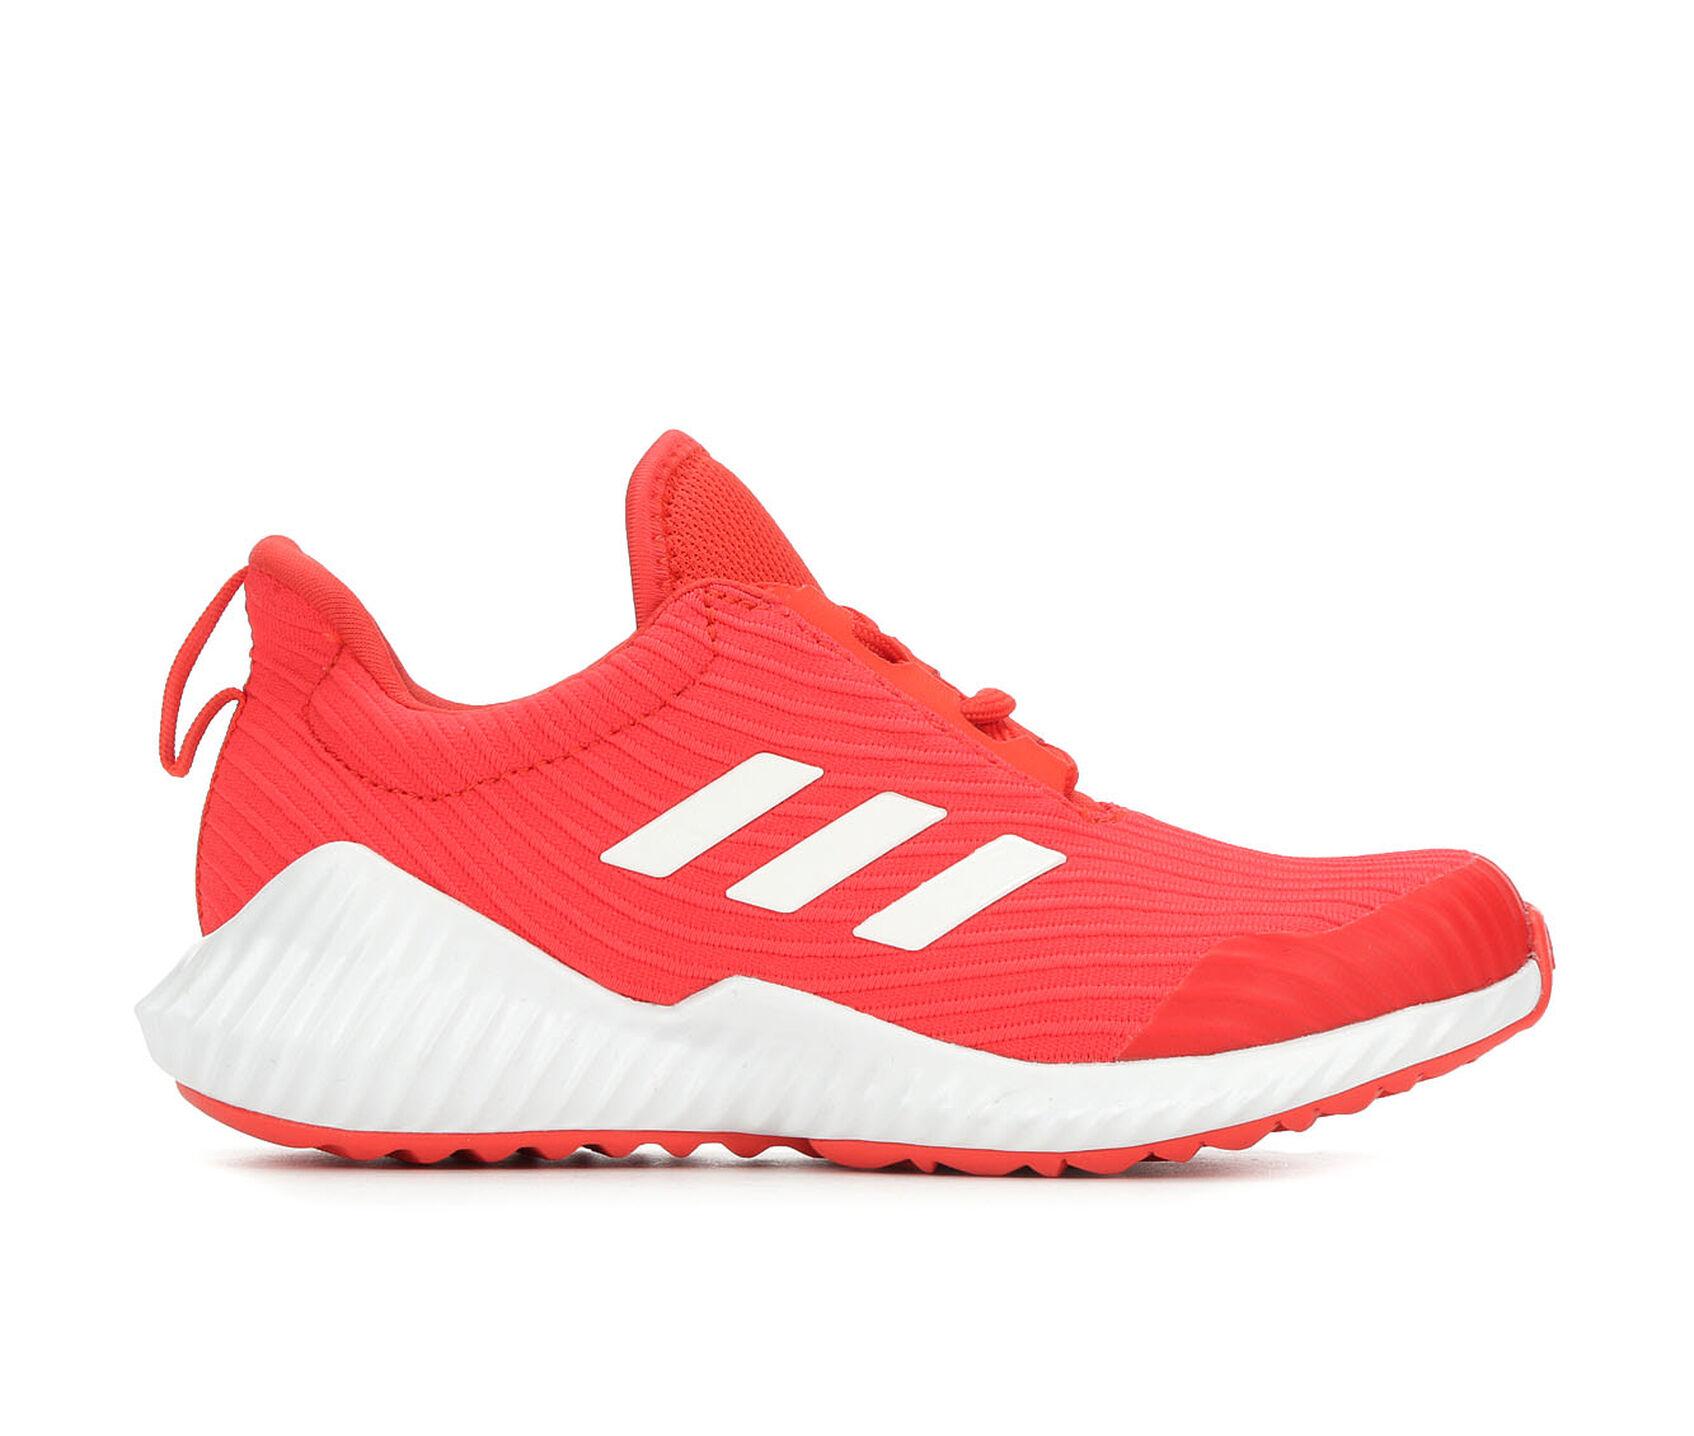 3a0a074b115 Boys  Adidas Little Kid   Big Kid FortaRun Running Shoes